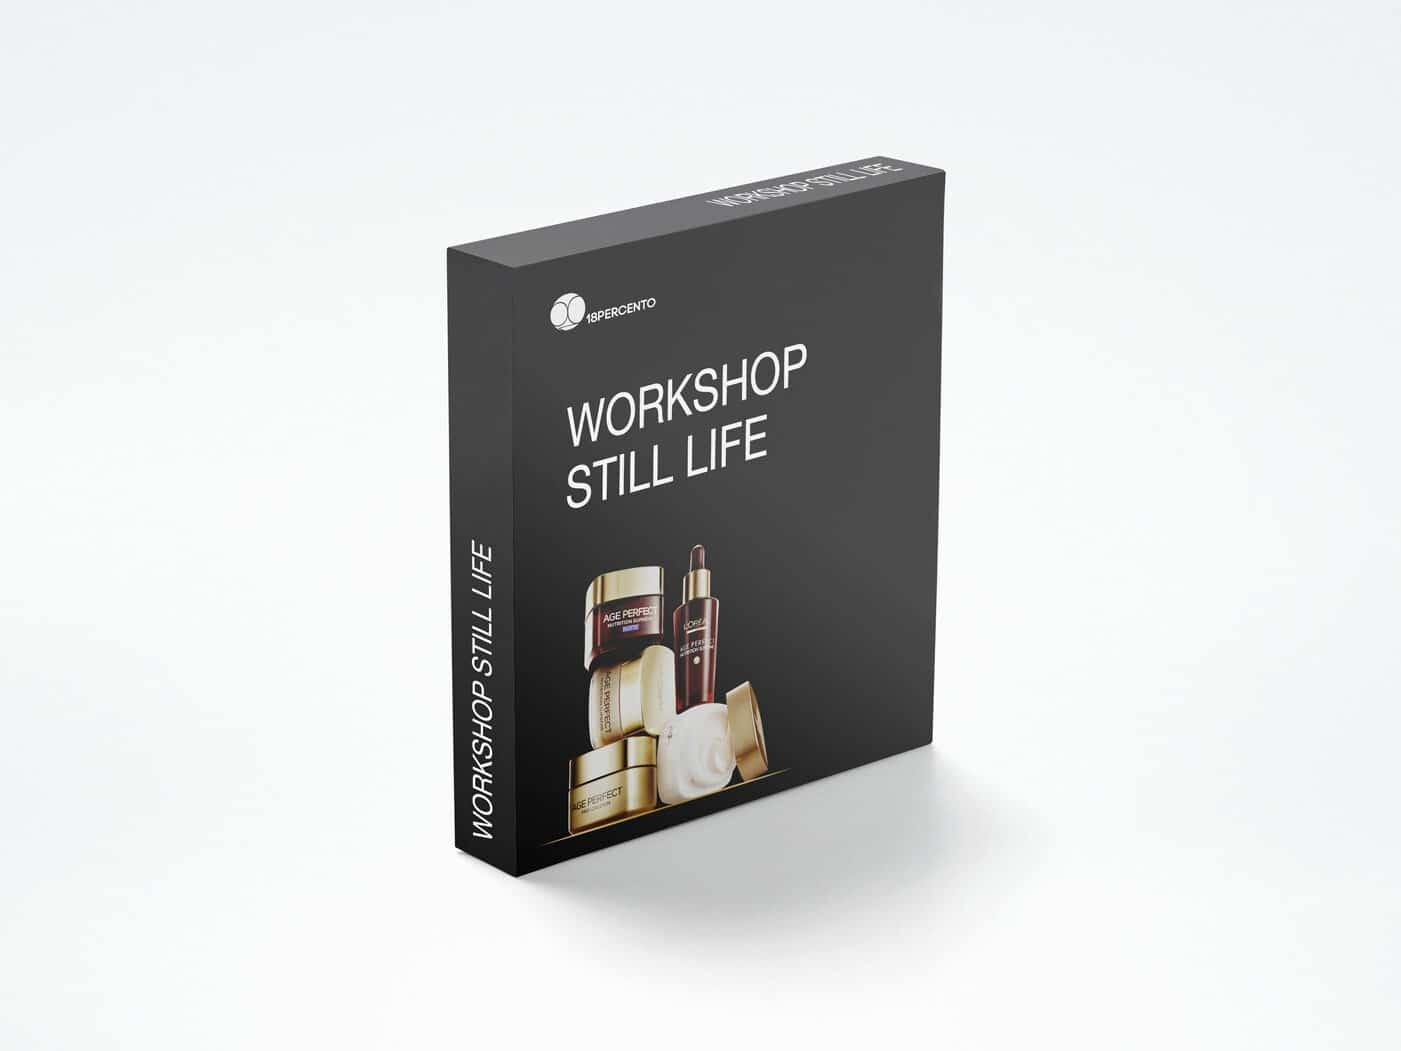 Workshop still life copertina